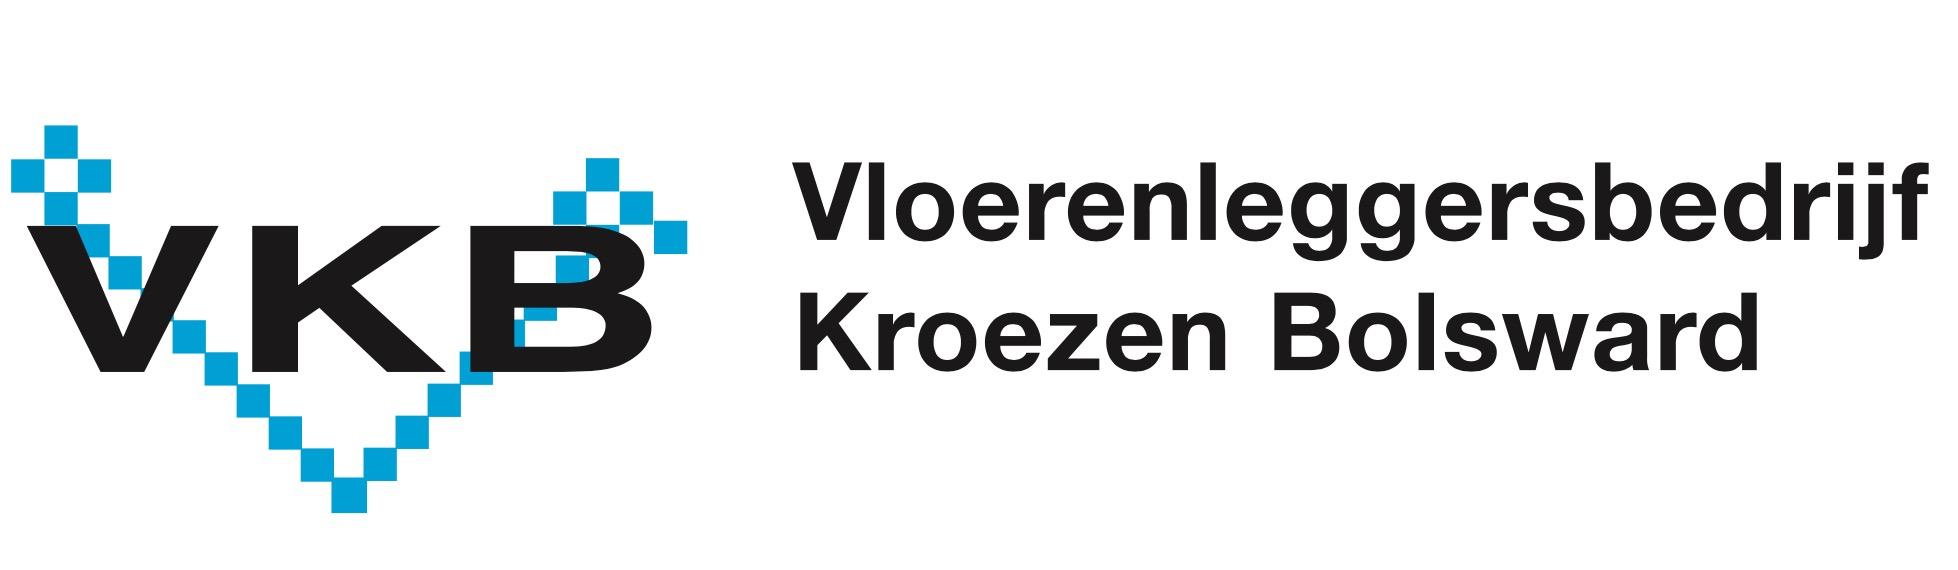 Vloerenleggersbedrijf Kroezen Bolsward